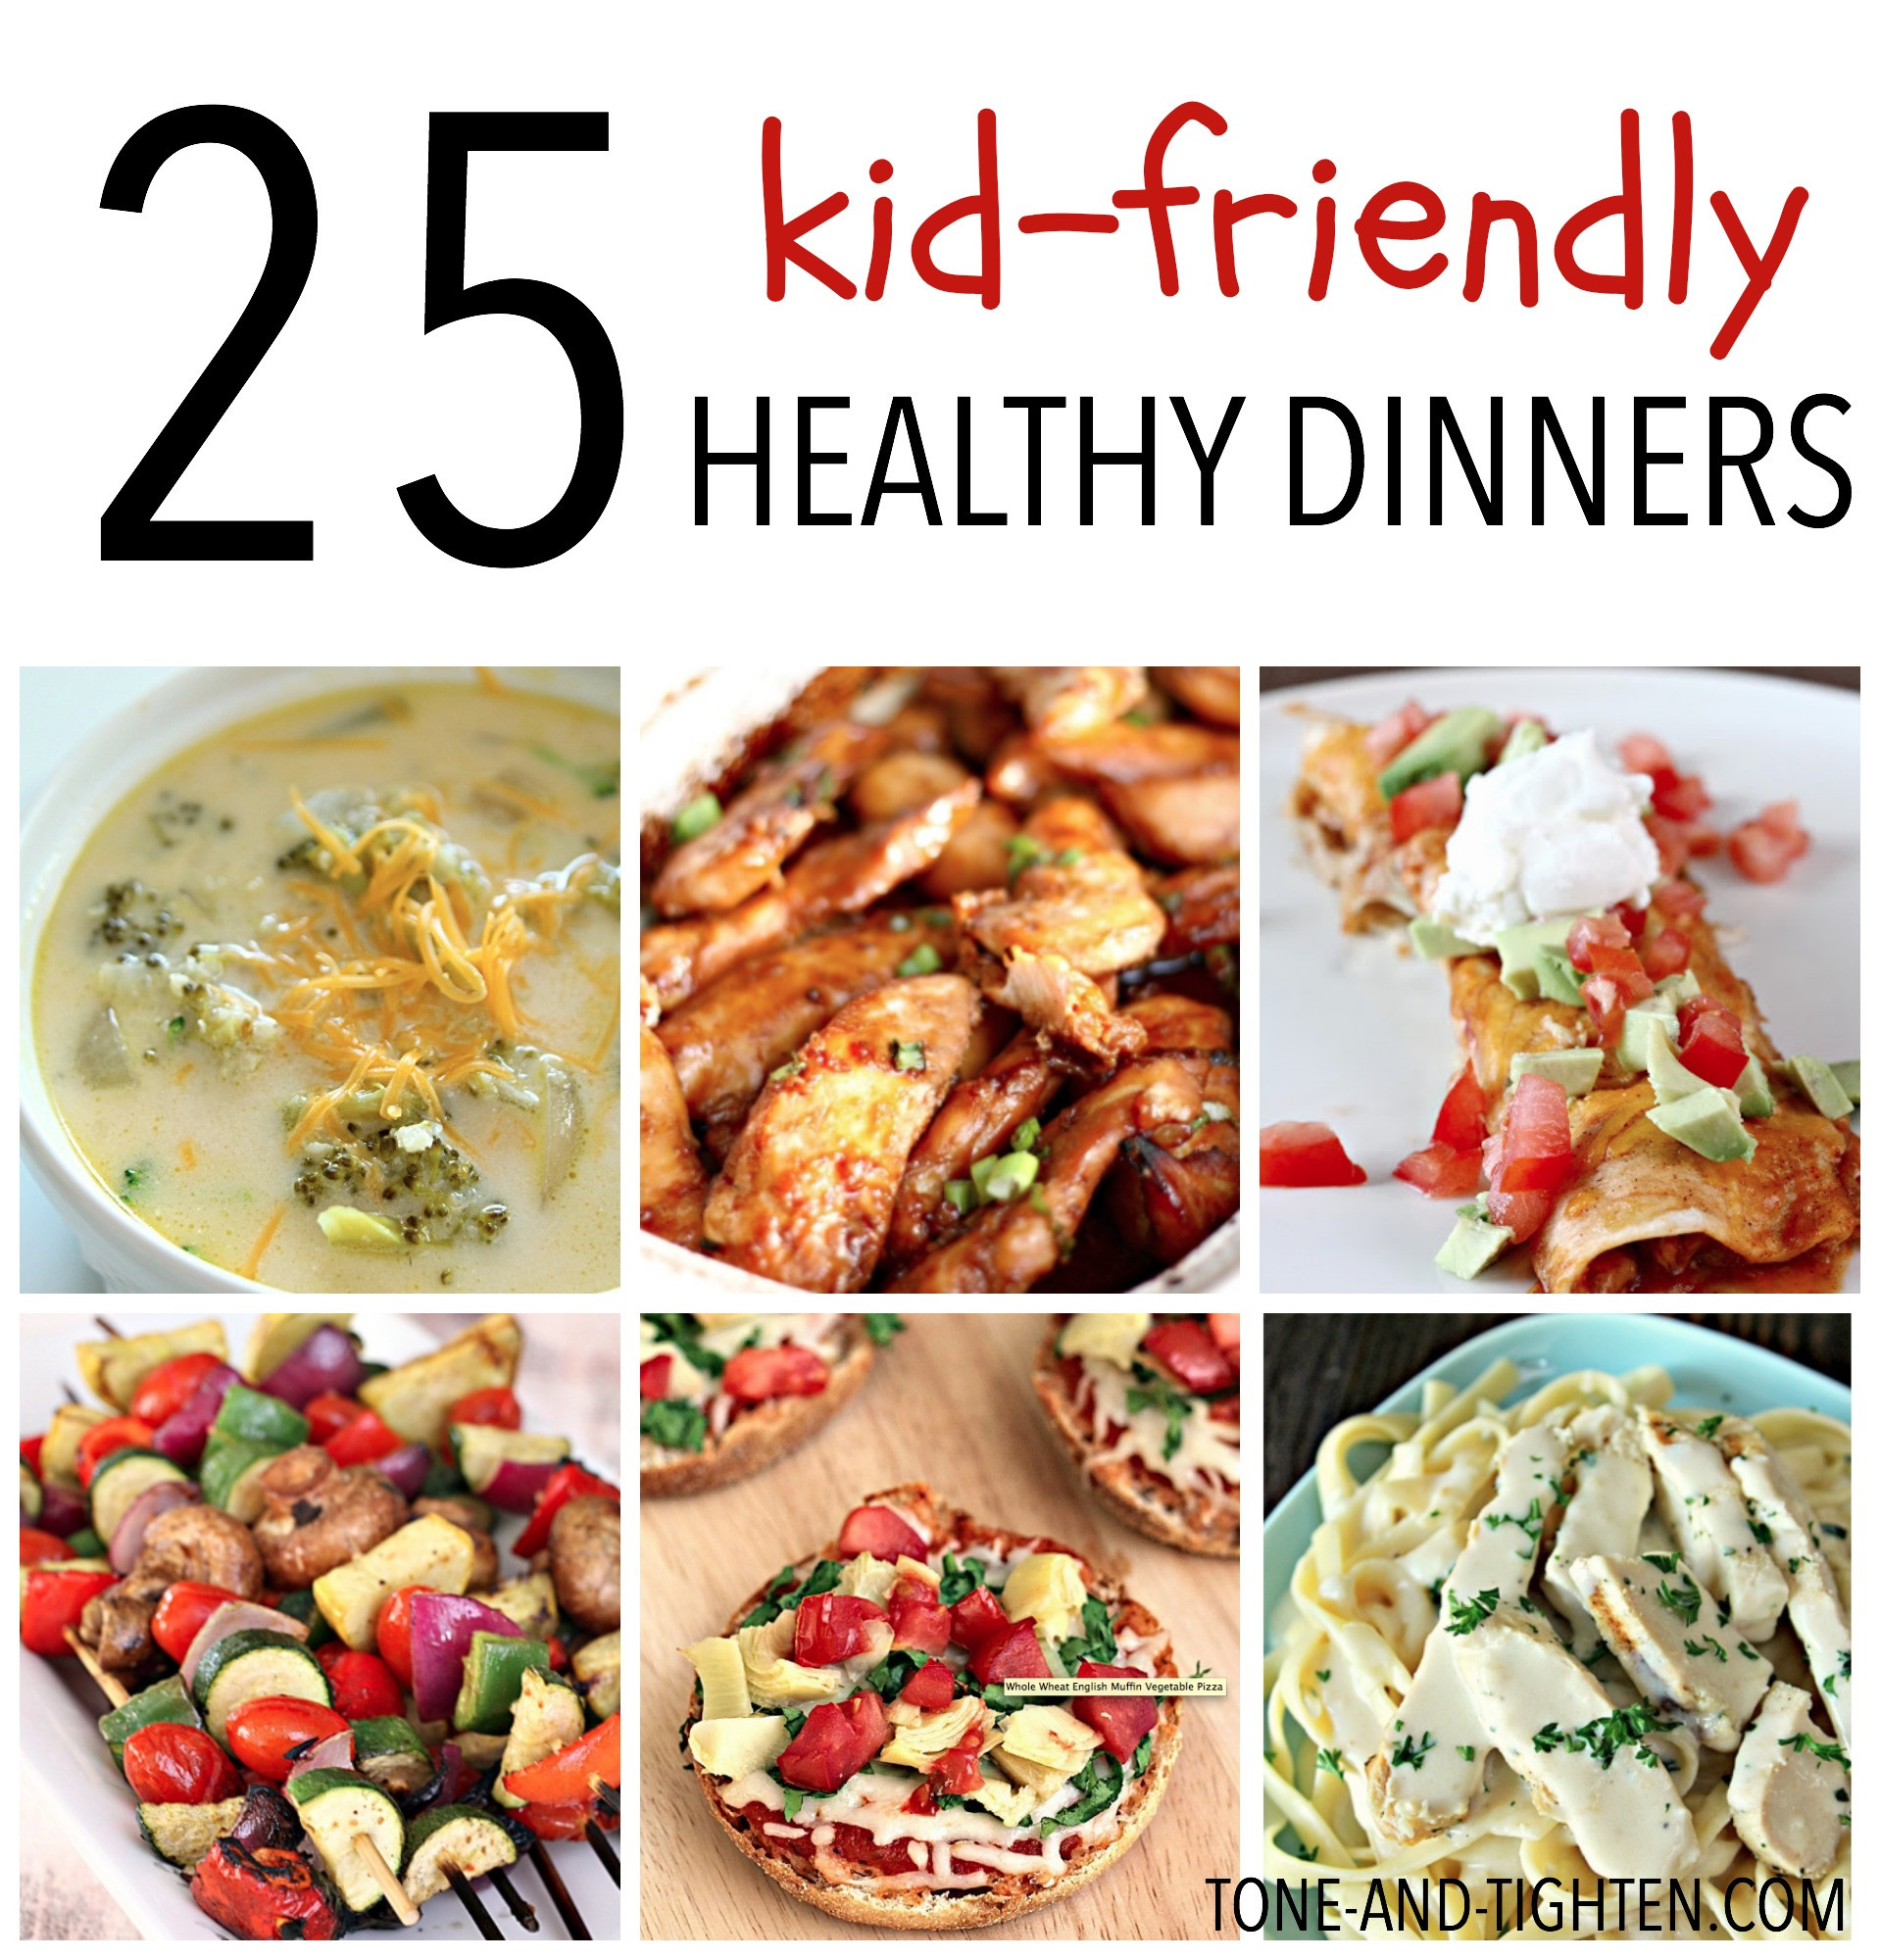 Healthy Dinner Ideas For Kids  25 Kid Friendly Healthy Dinners